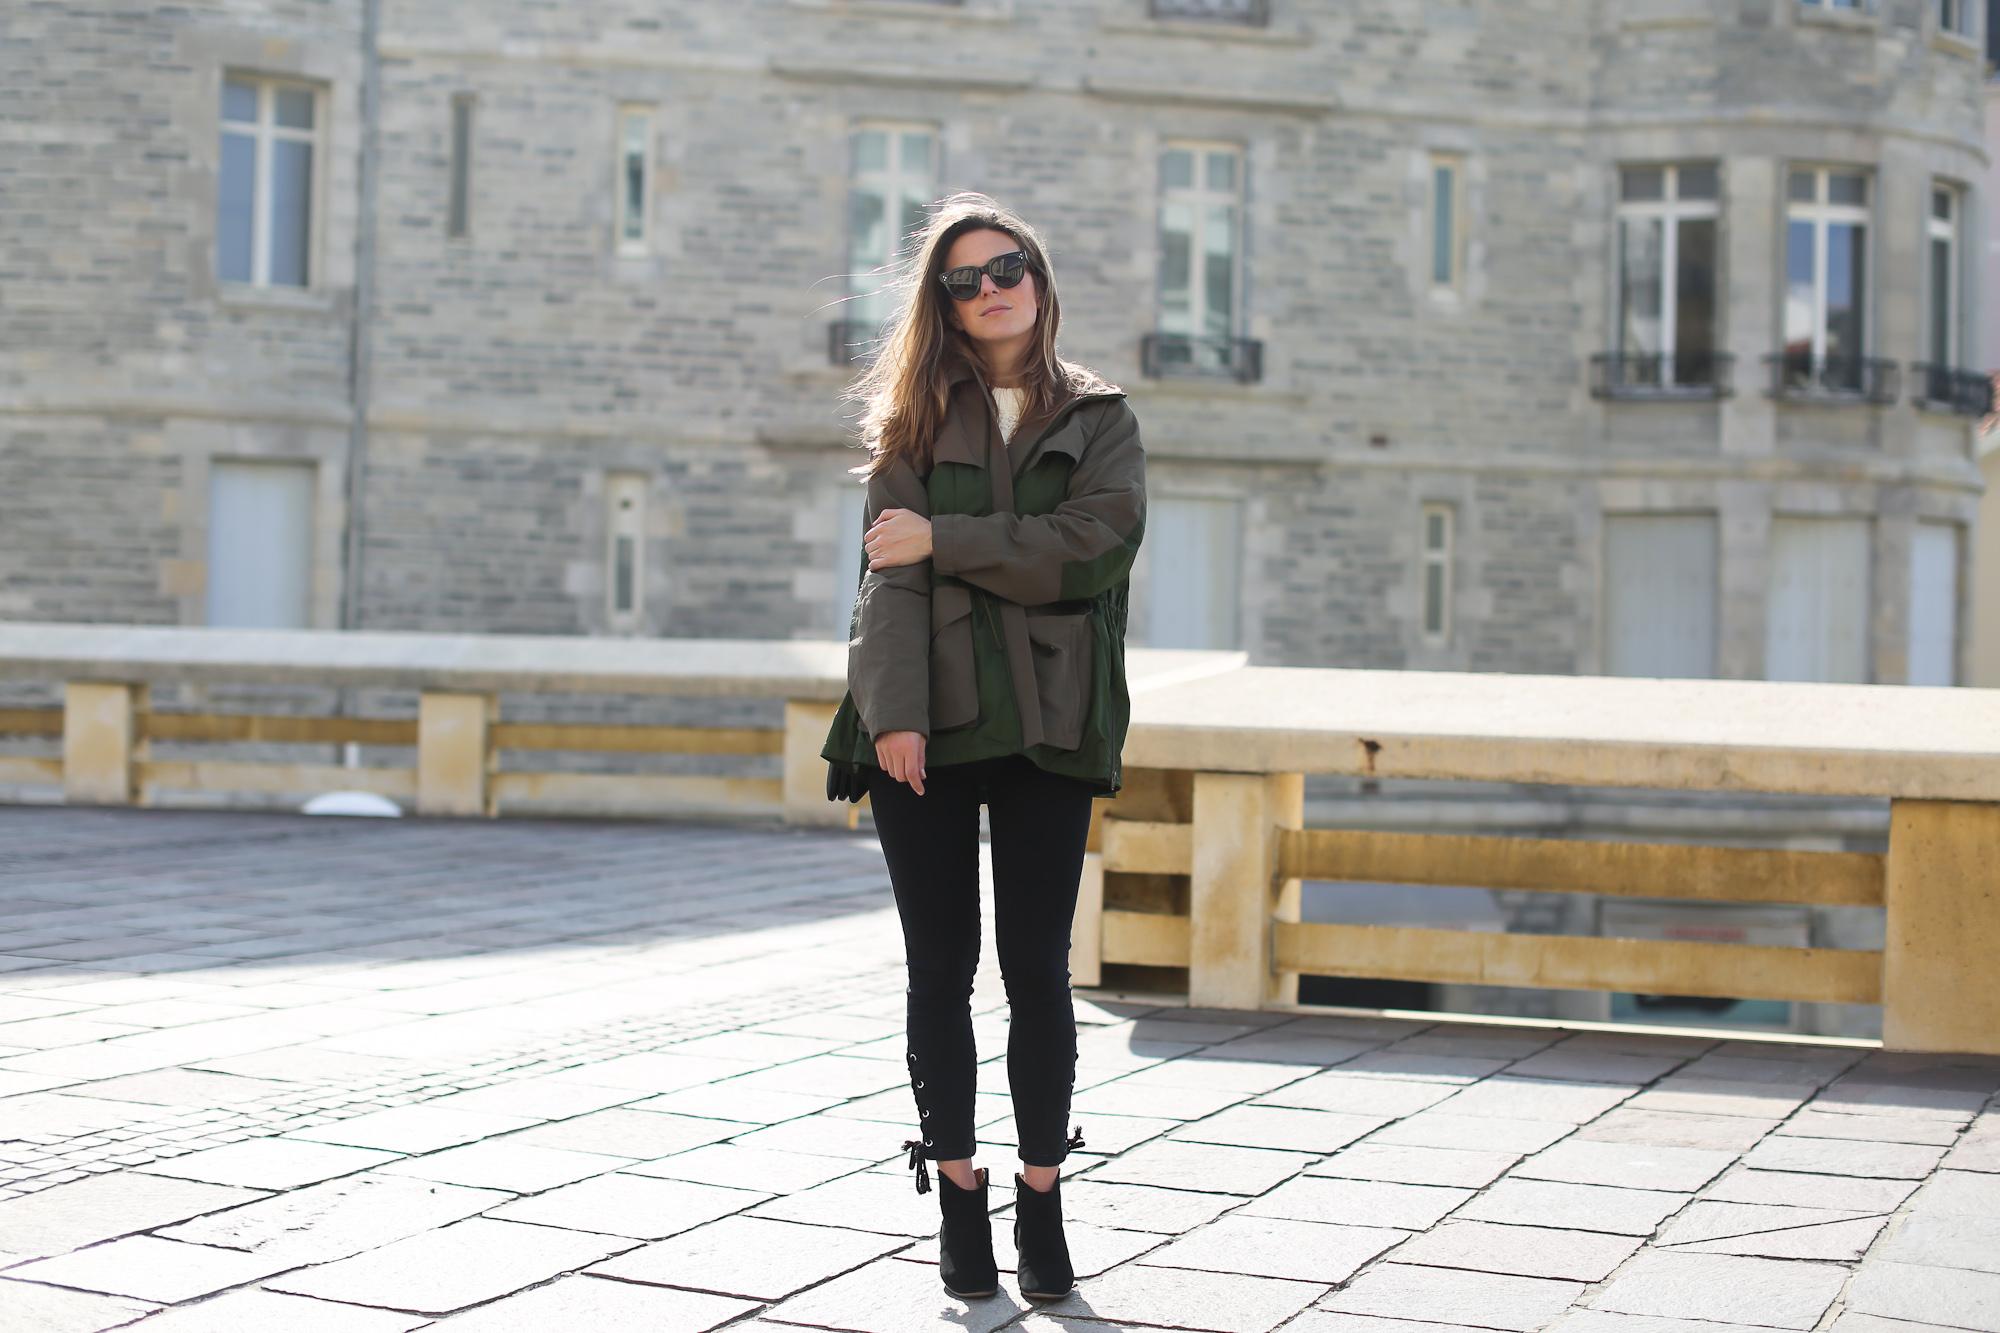 Clochet_streetstyle_h&mstudio_parka_isabelmarant_dicker_boots-2